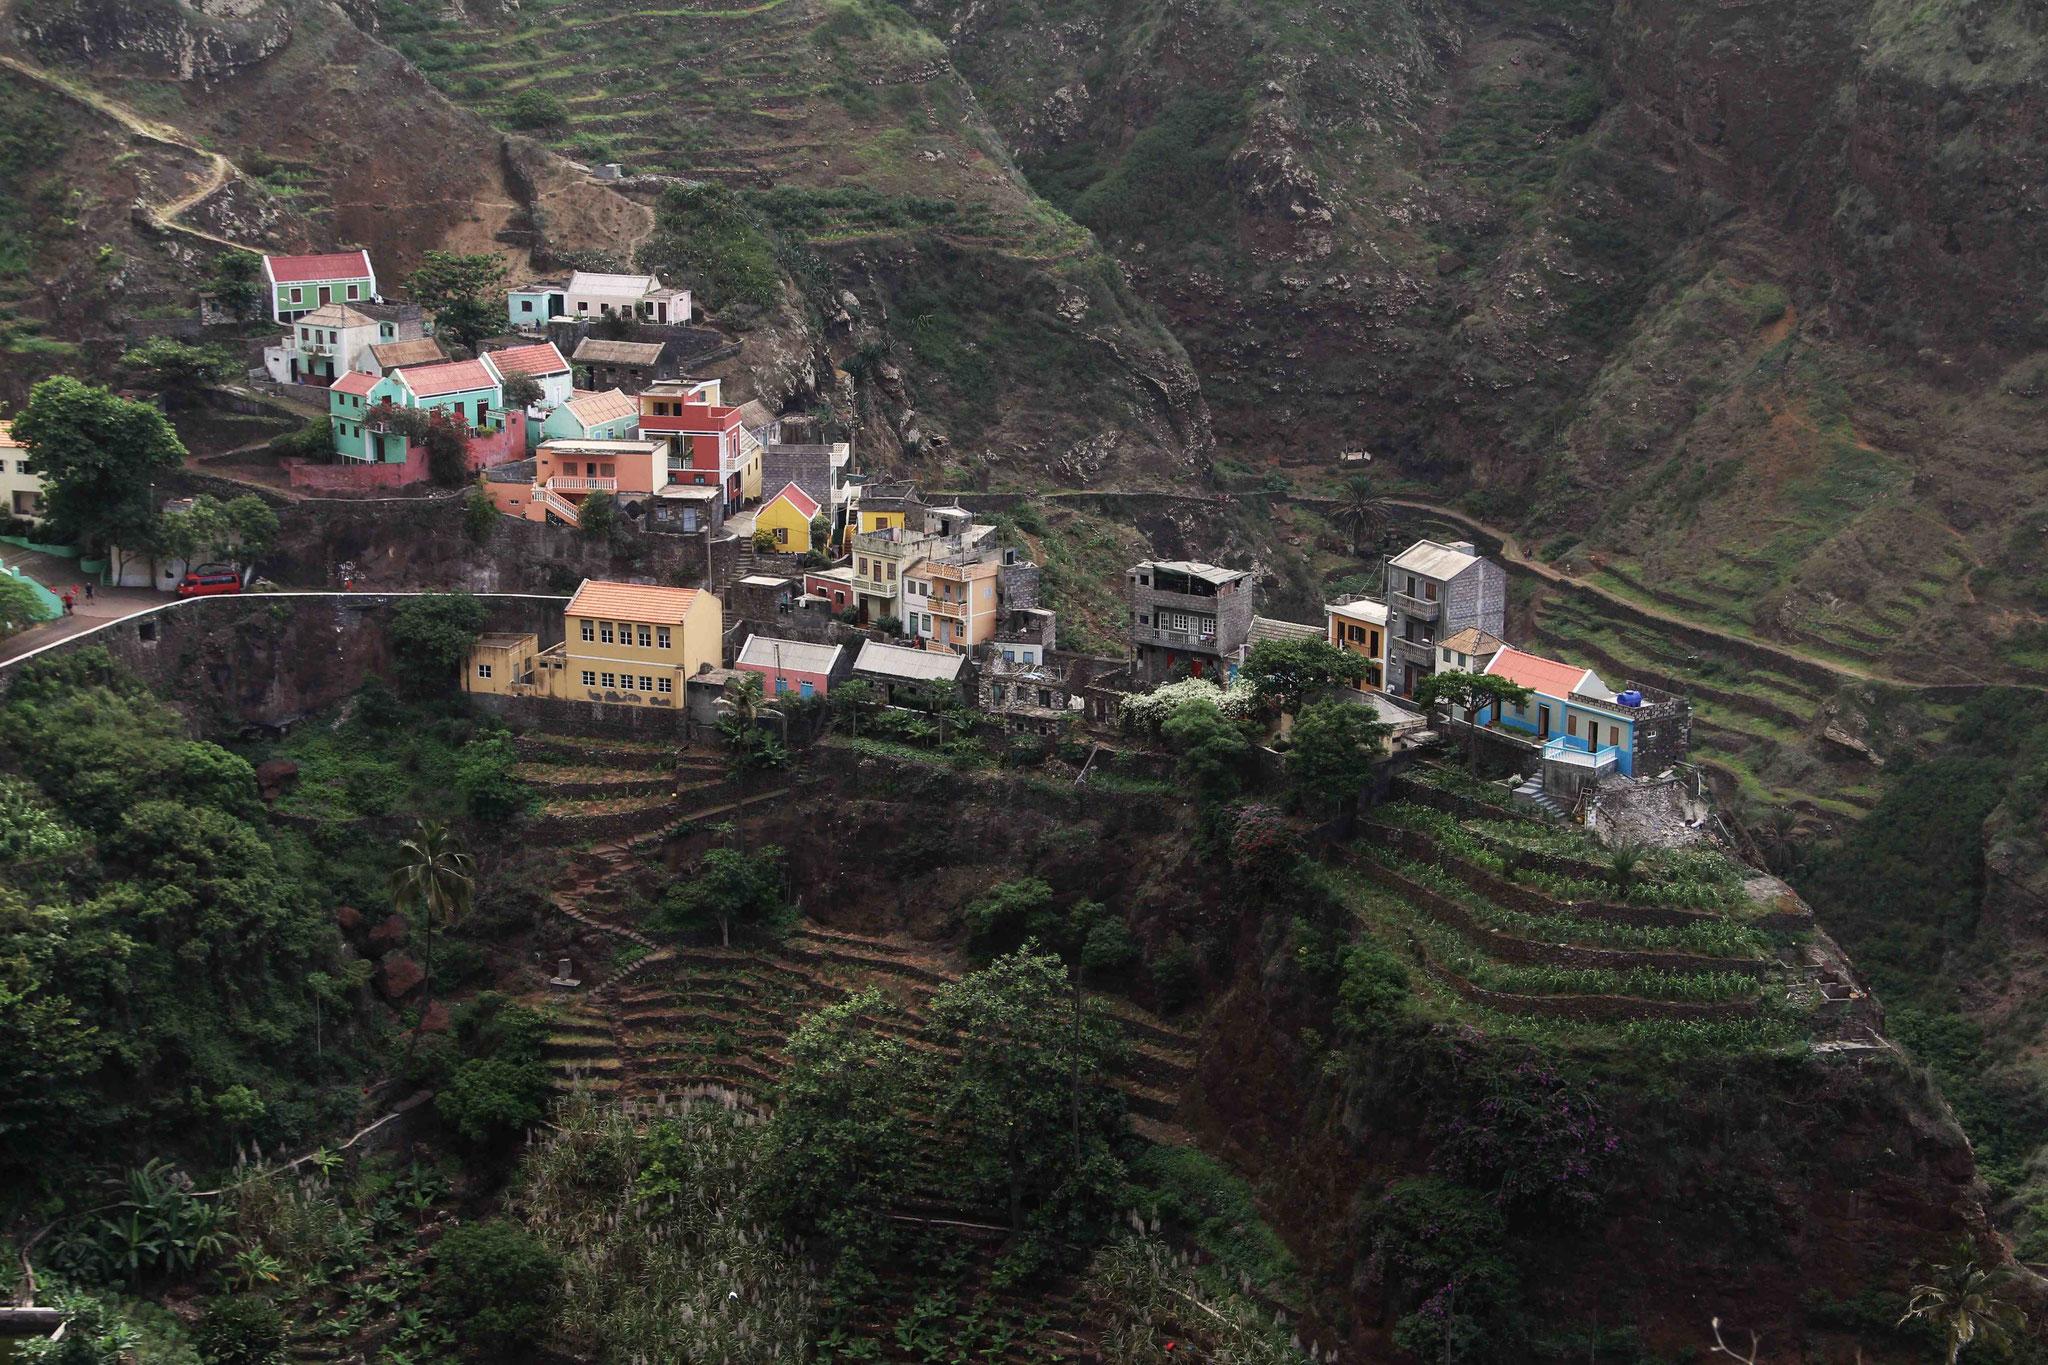 Santo Antao - Fontainas